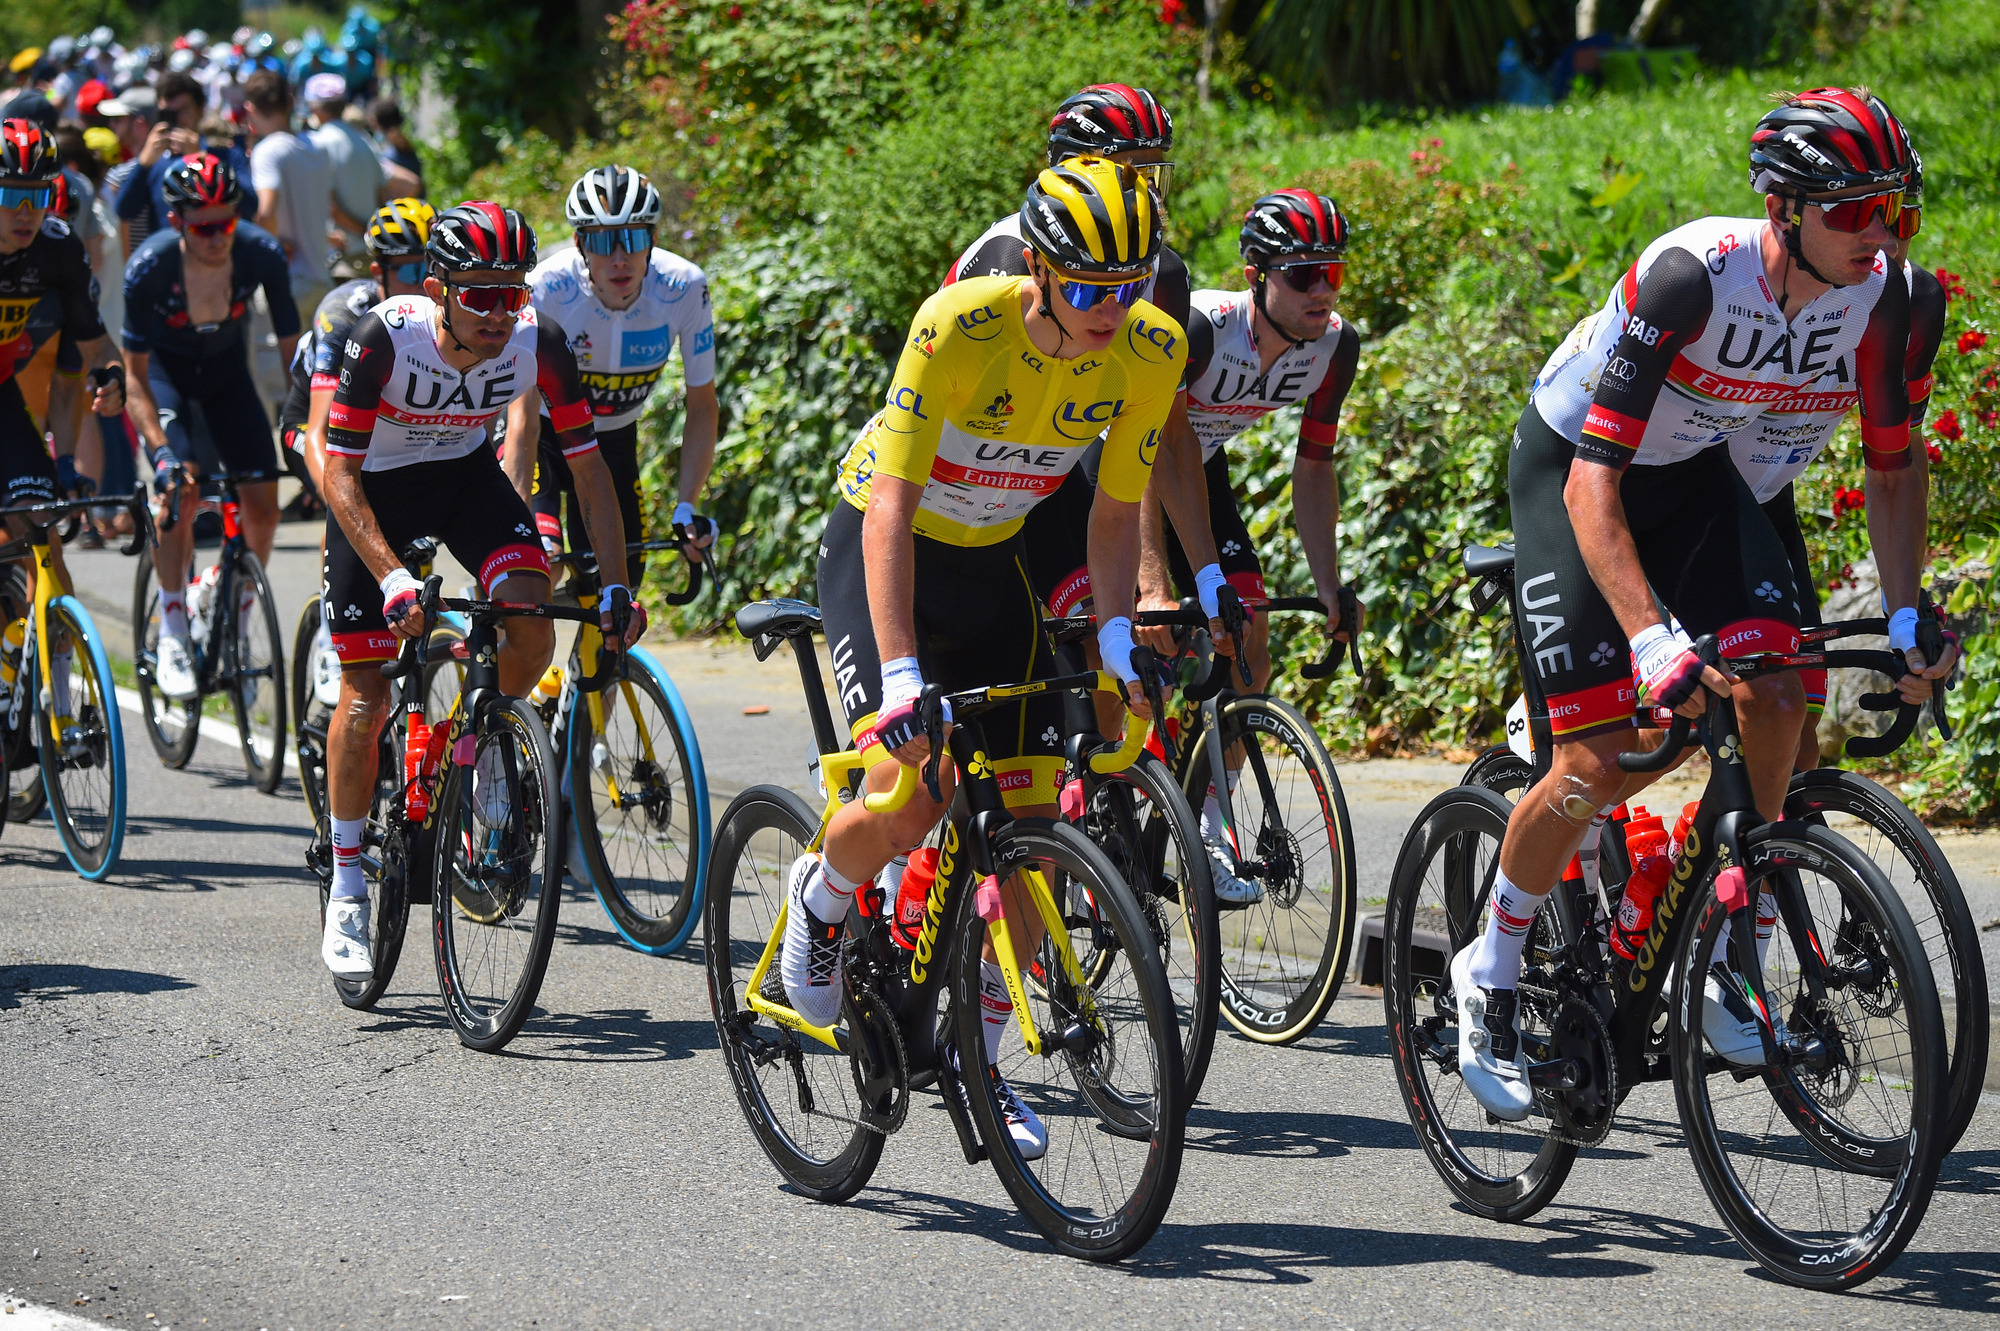 Tour de France 2021 108th Edition 19th stage Mourenx Libourne 207 km 16072021 Tadej Pogacar SLO UAE Team Emirates photo Dario BelingheriBettiniPhoto2021